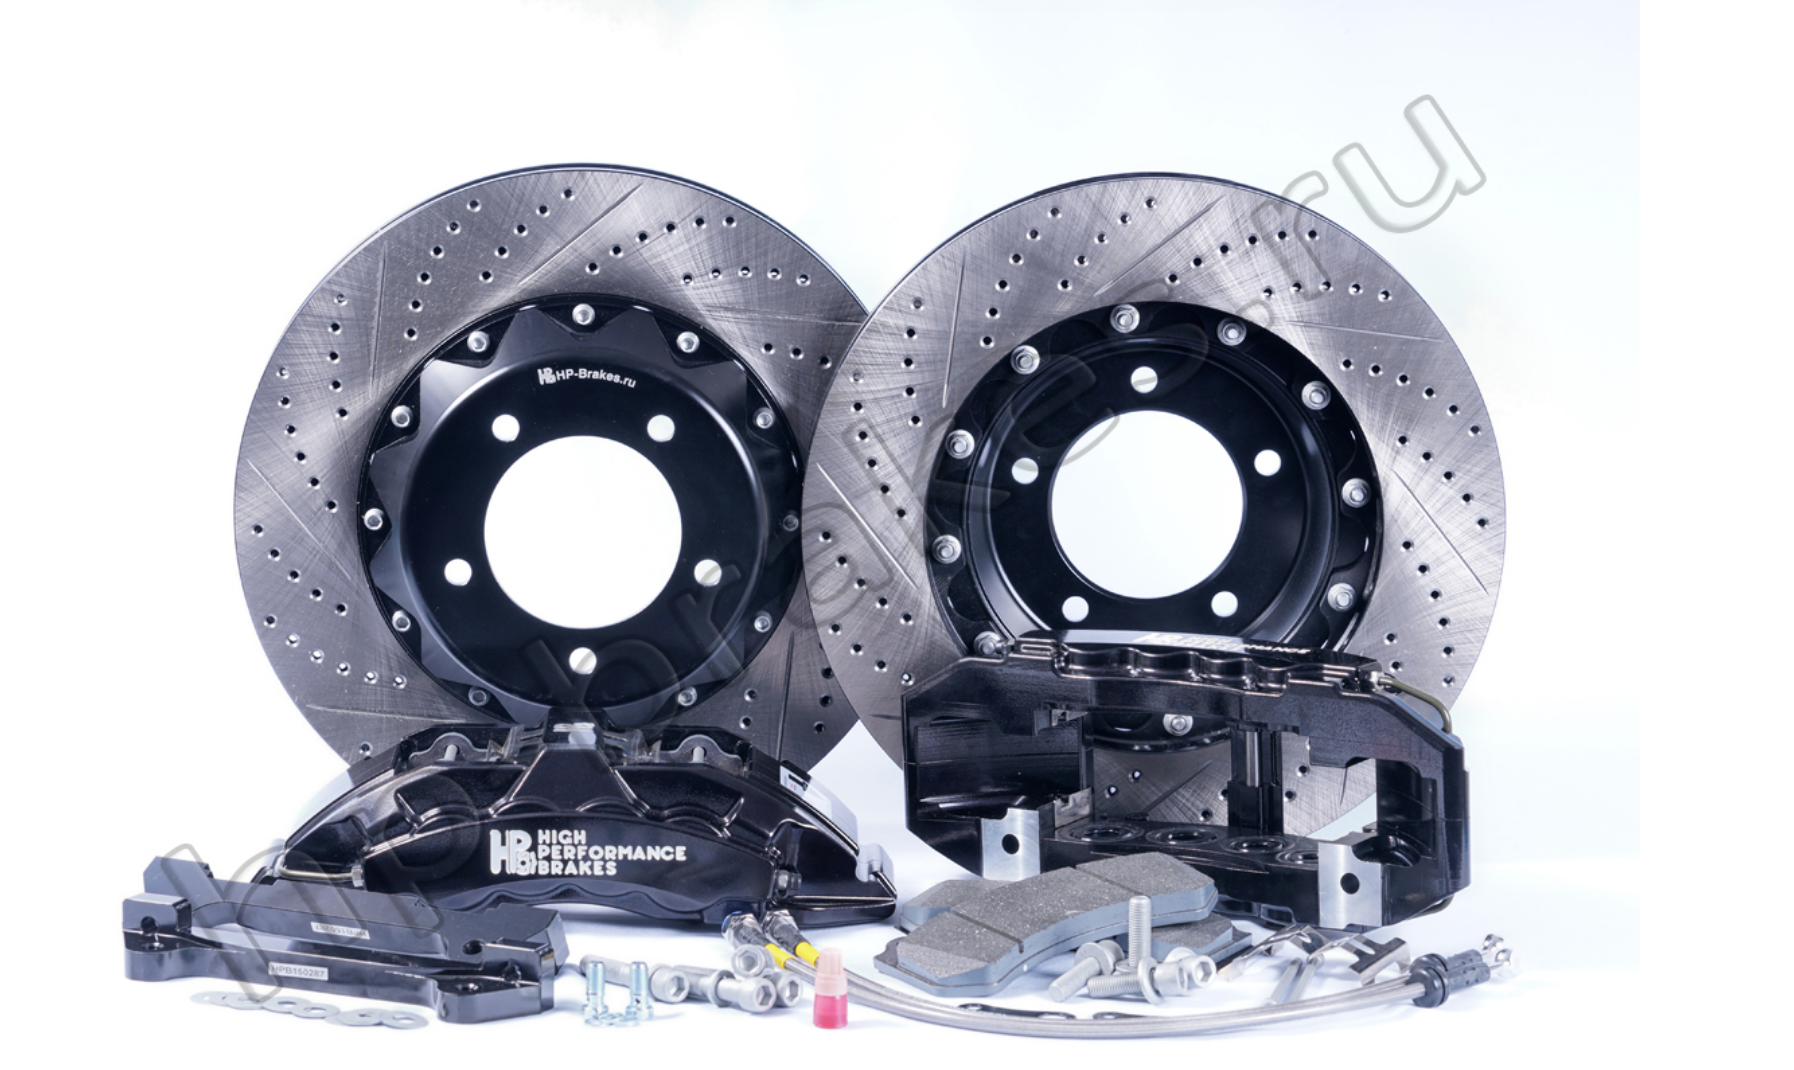 Тормозная система HP Brakes (Передняя ось, D22, 8 поршней, диск 430х36мм)